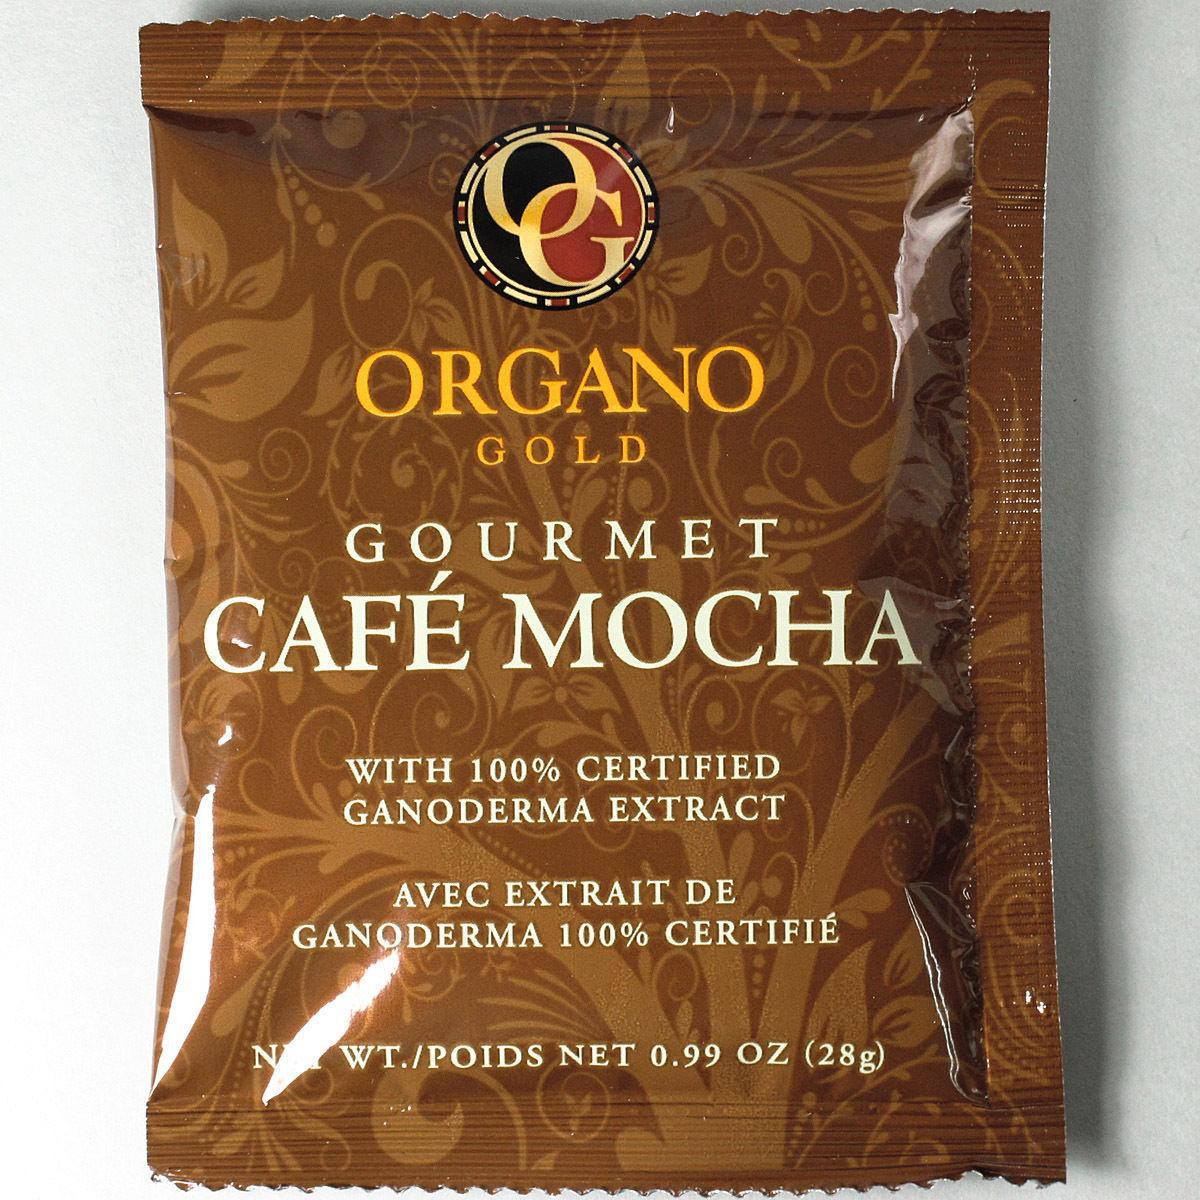 3 BOXES - ORGANO GOLD GOURMET CAFE MOCHA - GANODERMA EXP 06/2021 FREE SHIPPING